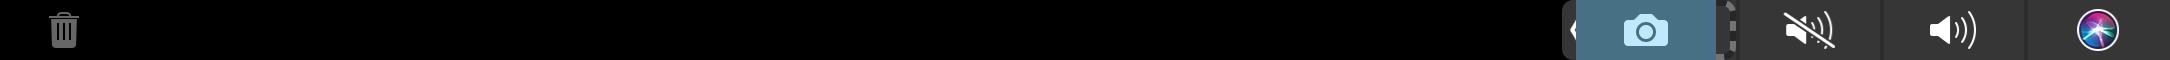 touchbar自定义快捷键